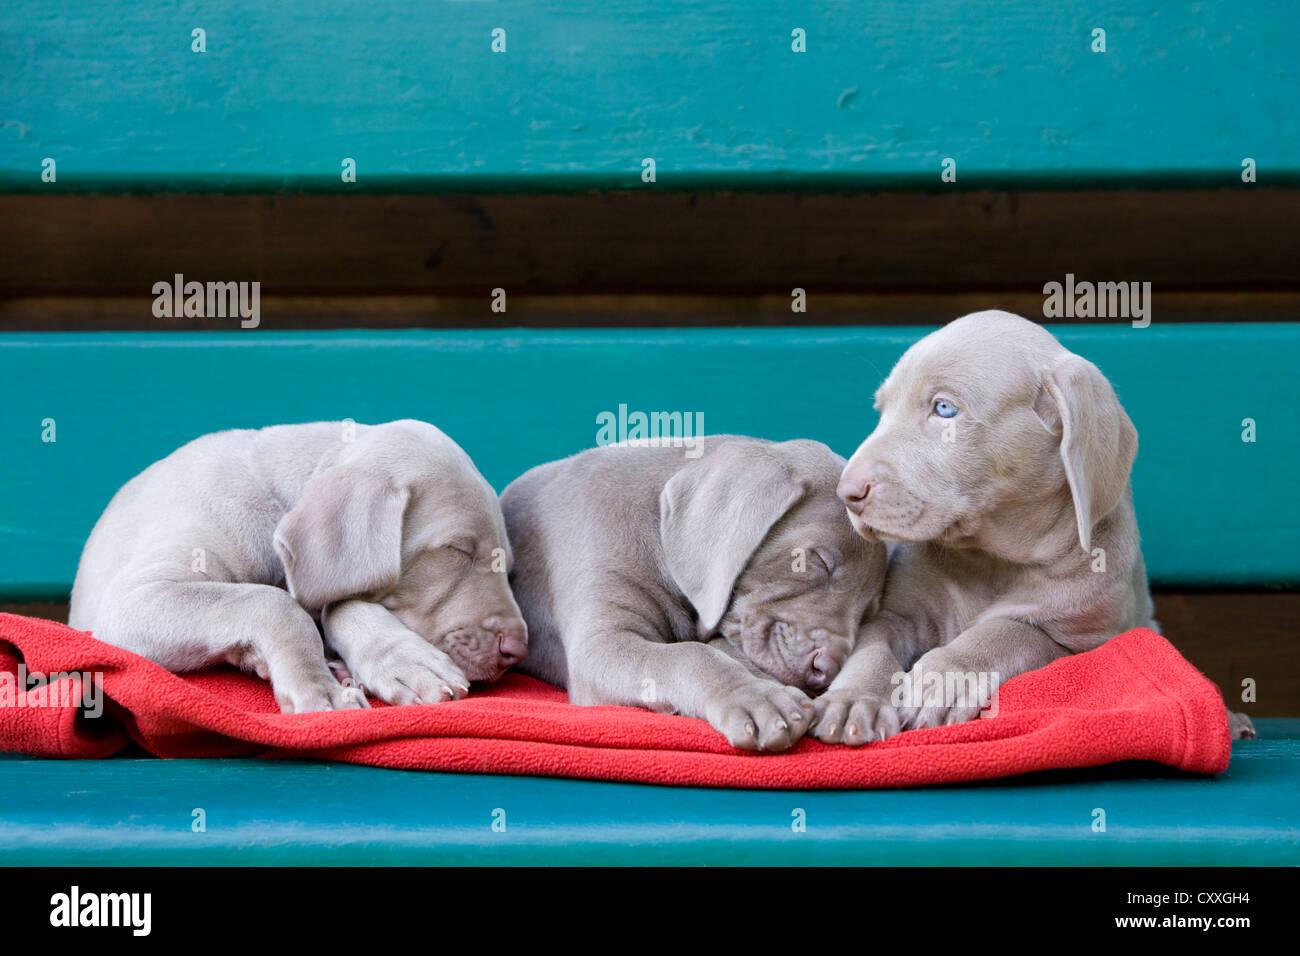 Weimaraner dogs, puppies, sleeping on a bench, North Tyrol, Austria, Europe - Stock Image